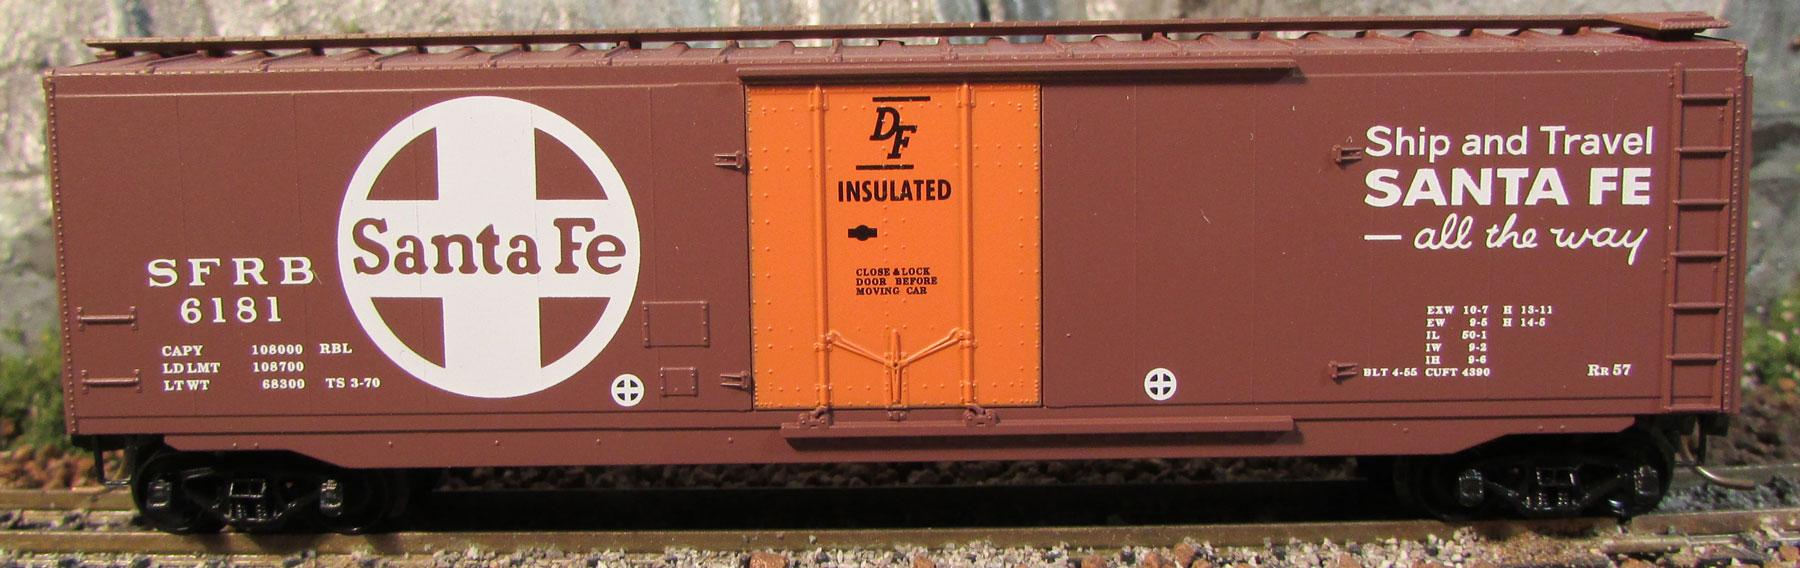 N Scale - Micro-Trains - 32050.4 - Boxcar, 50 Foot, Steel, Plug Door - Santa Fe - 6181